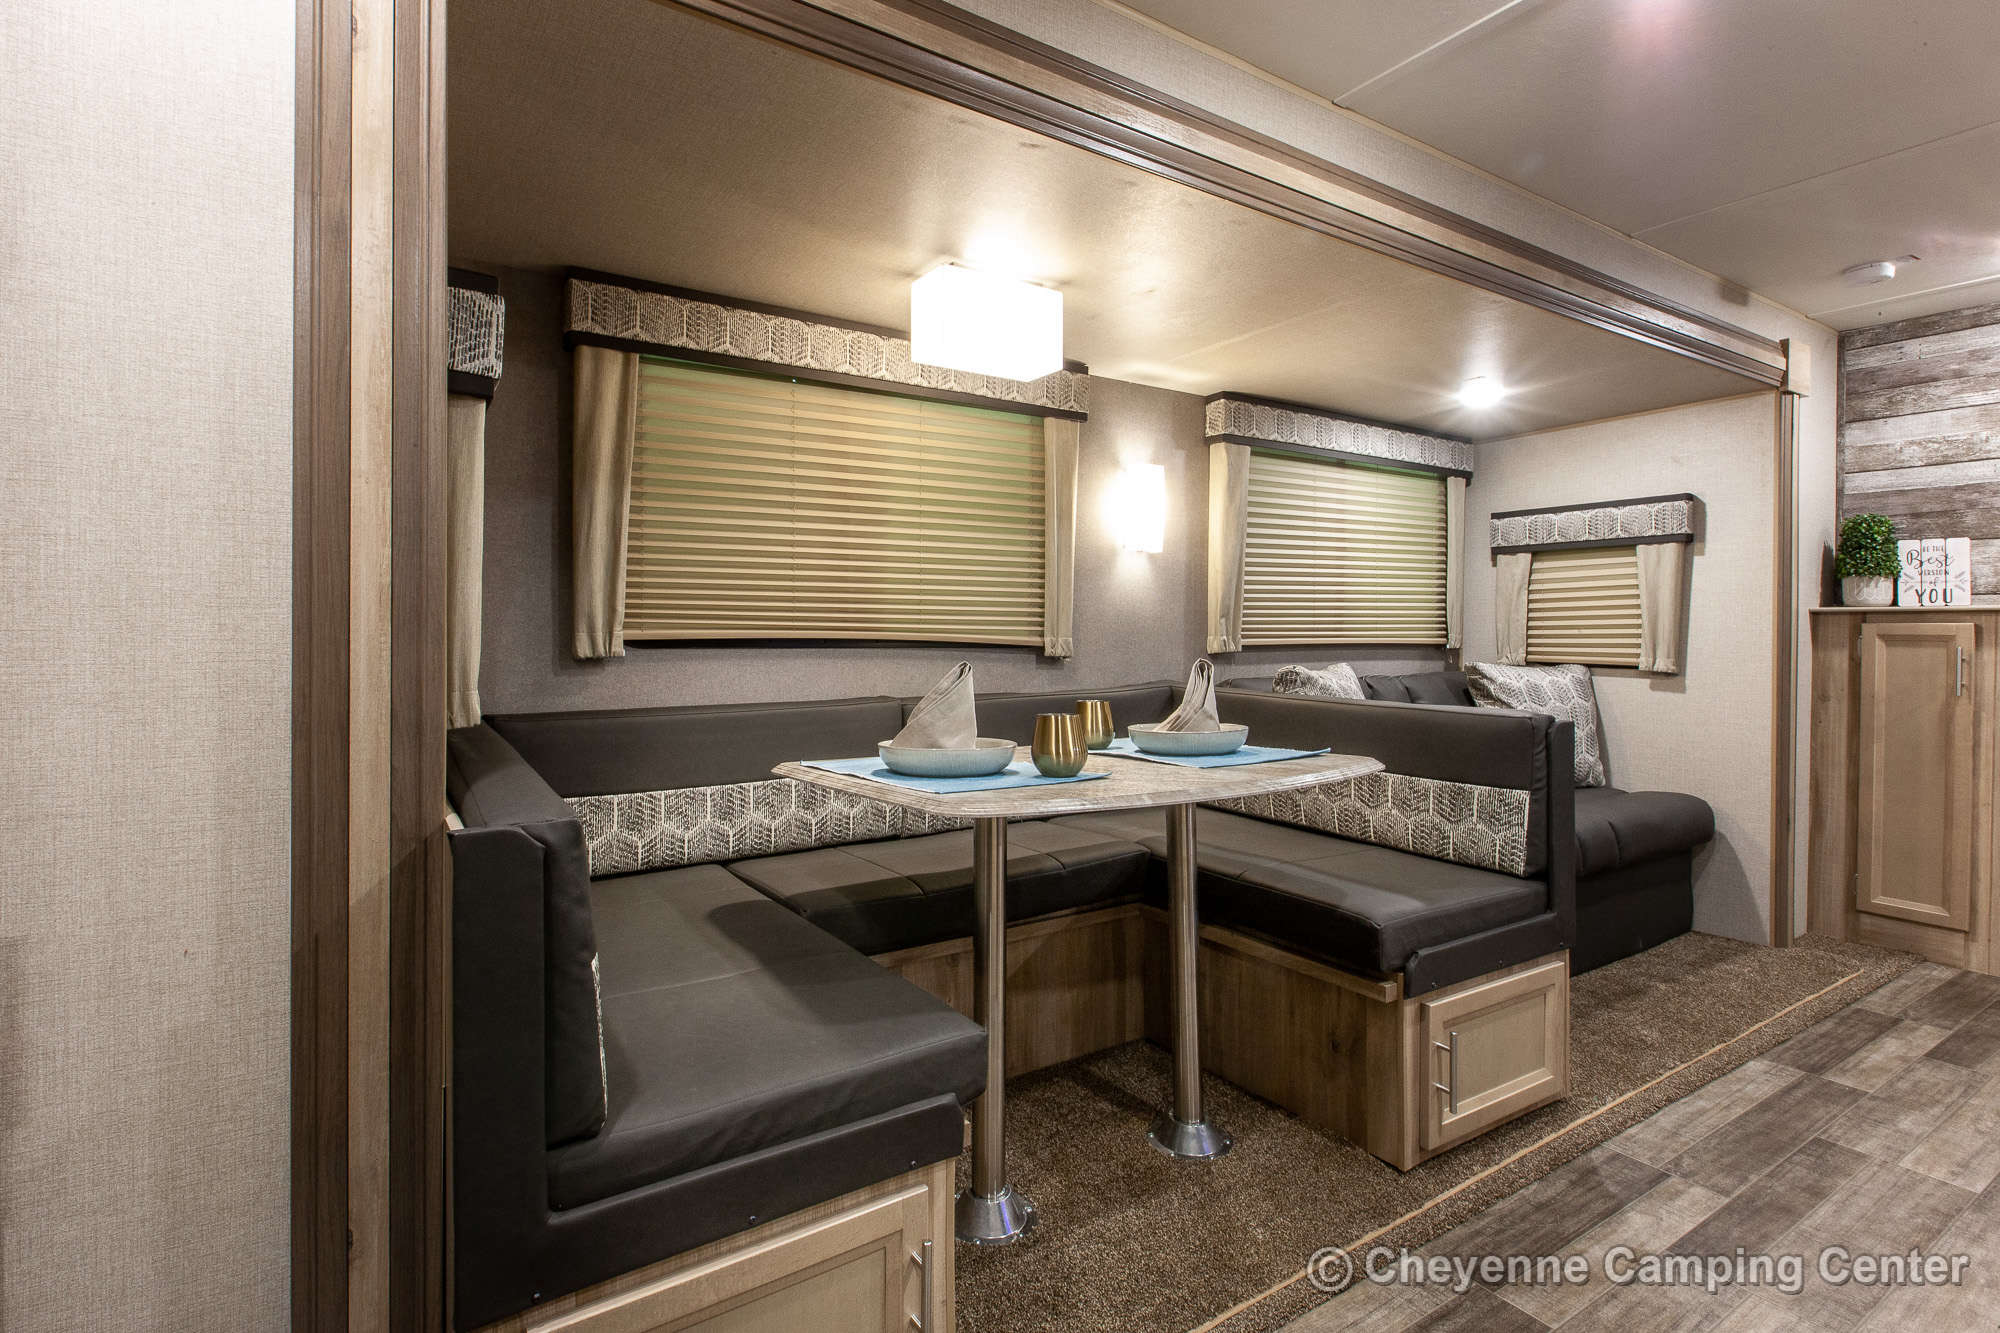 2021 Coachmen Catalina Legacy Edition 323BHDSCK Bunkhouse Travel Trailer Interior Image